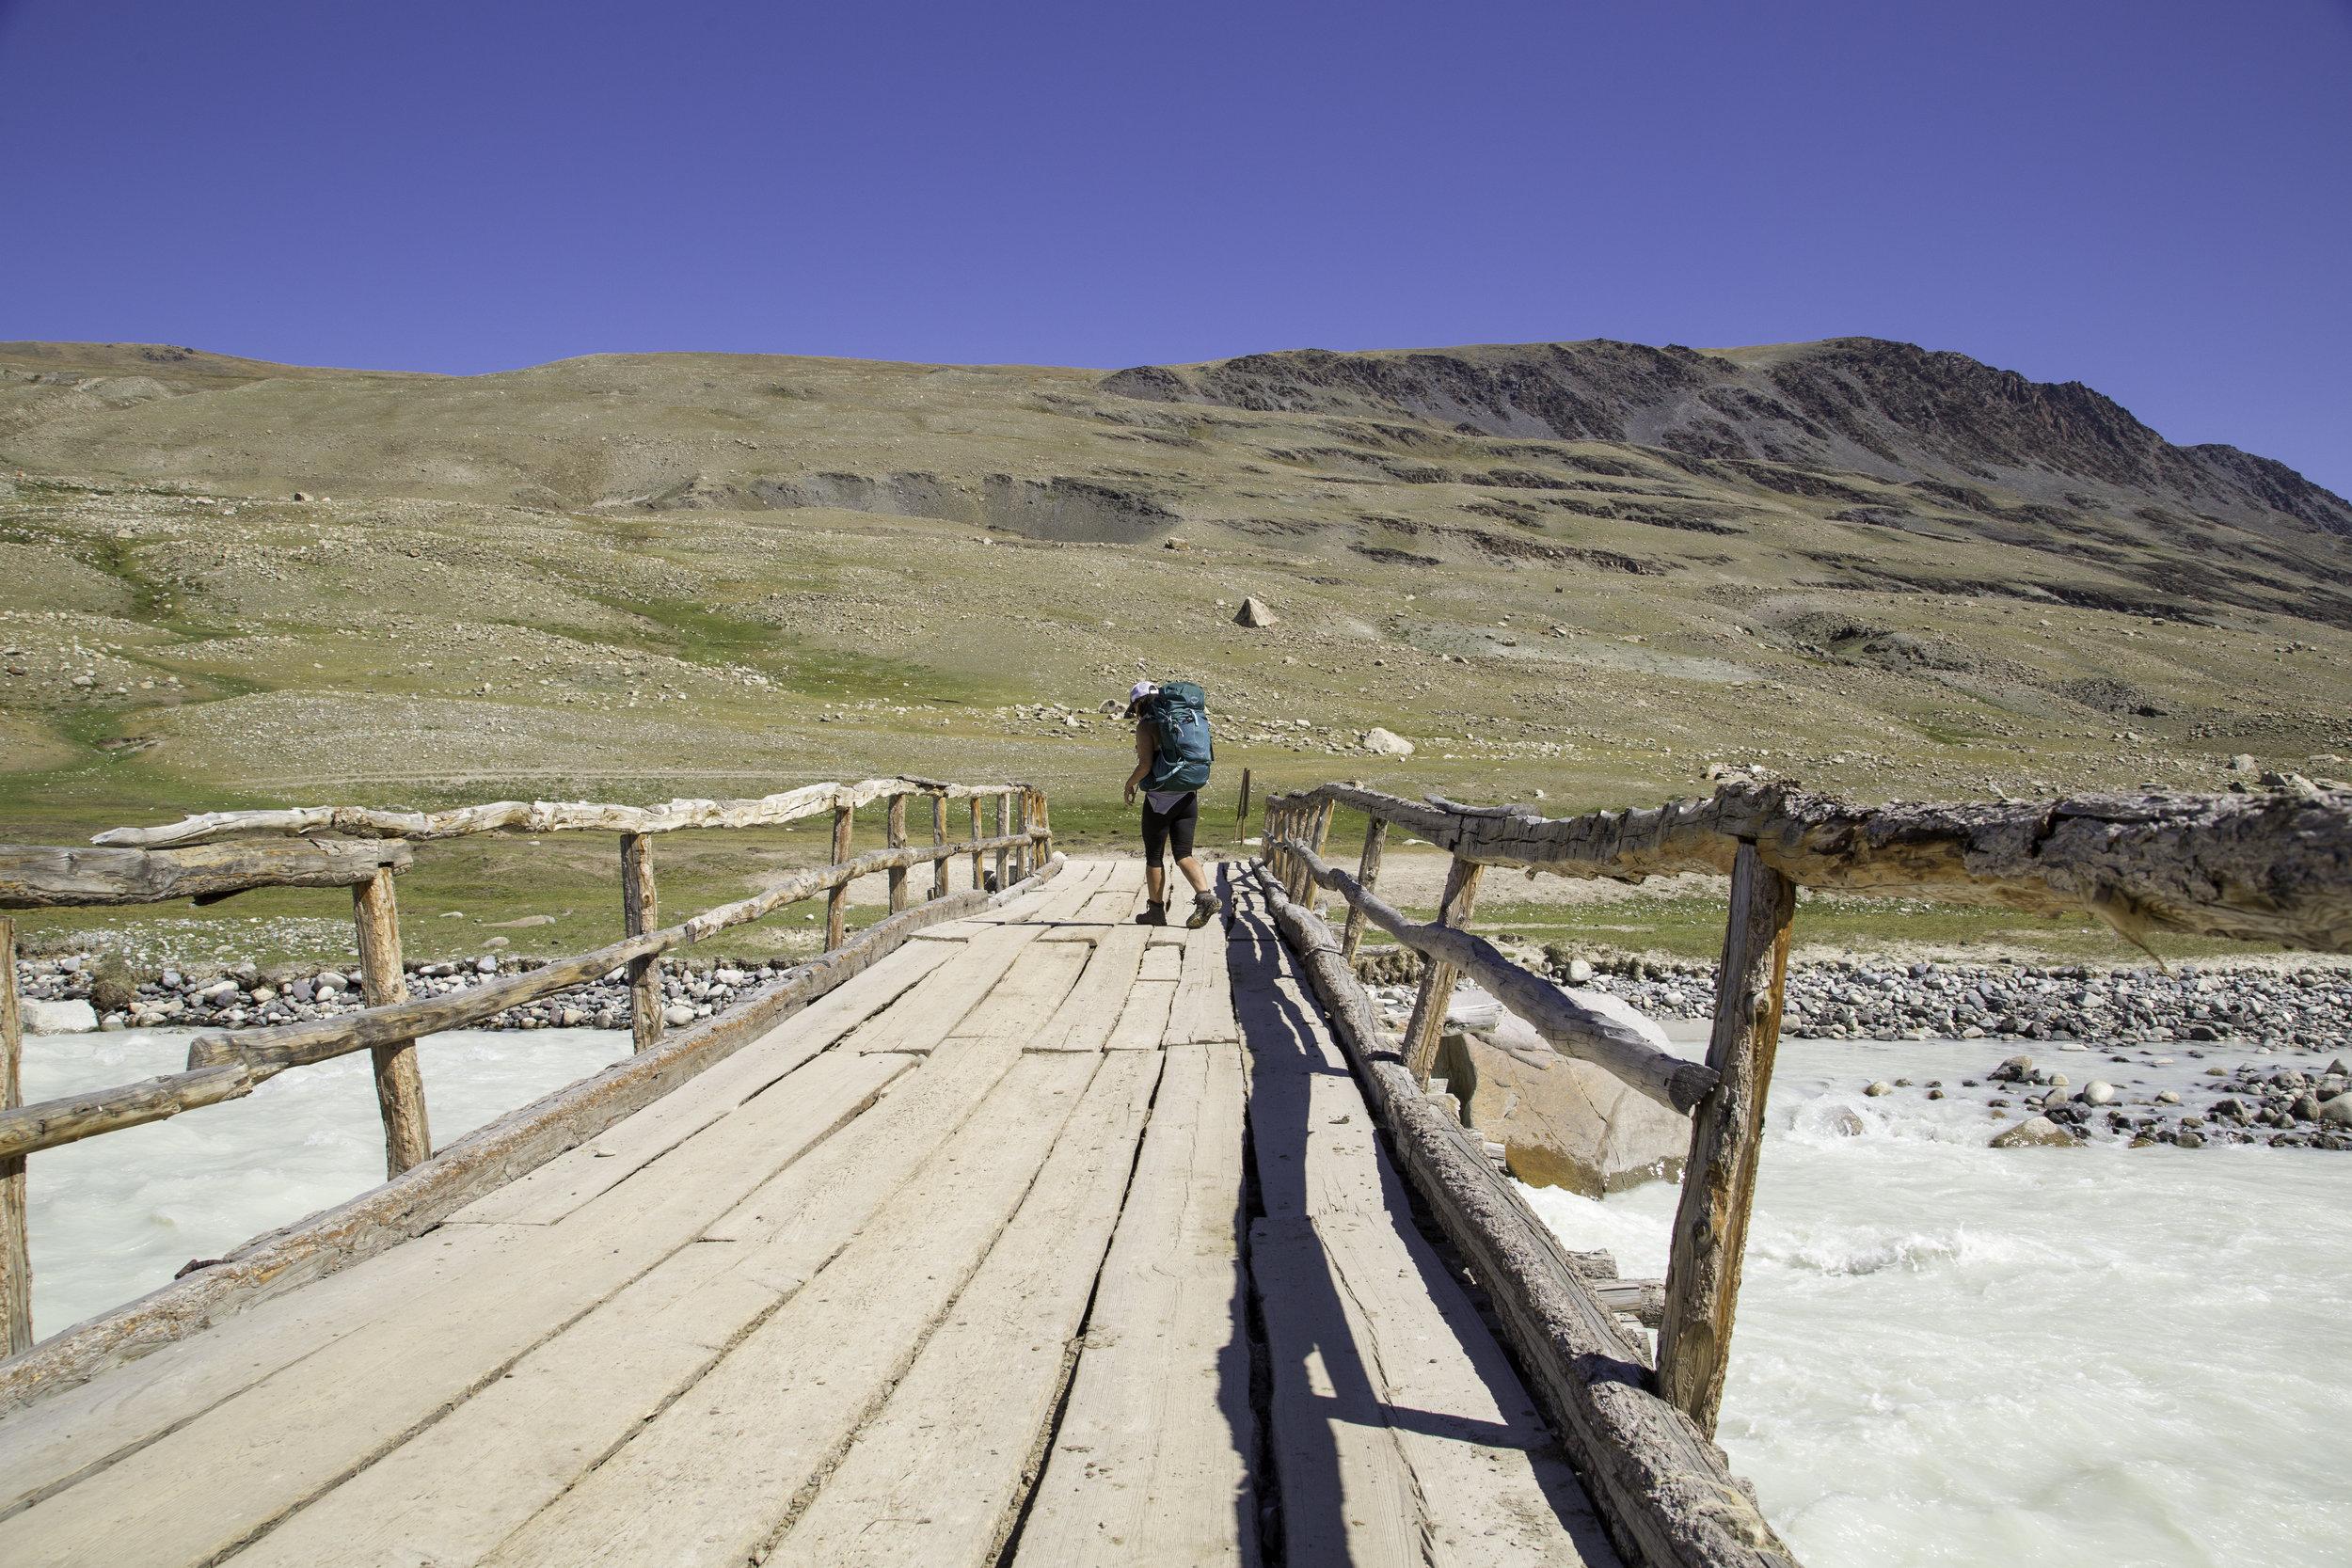 Mongolia walking tour edgewalkers 35.jpg